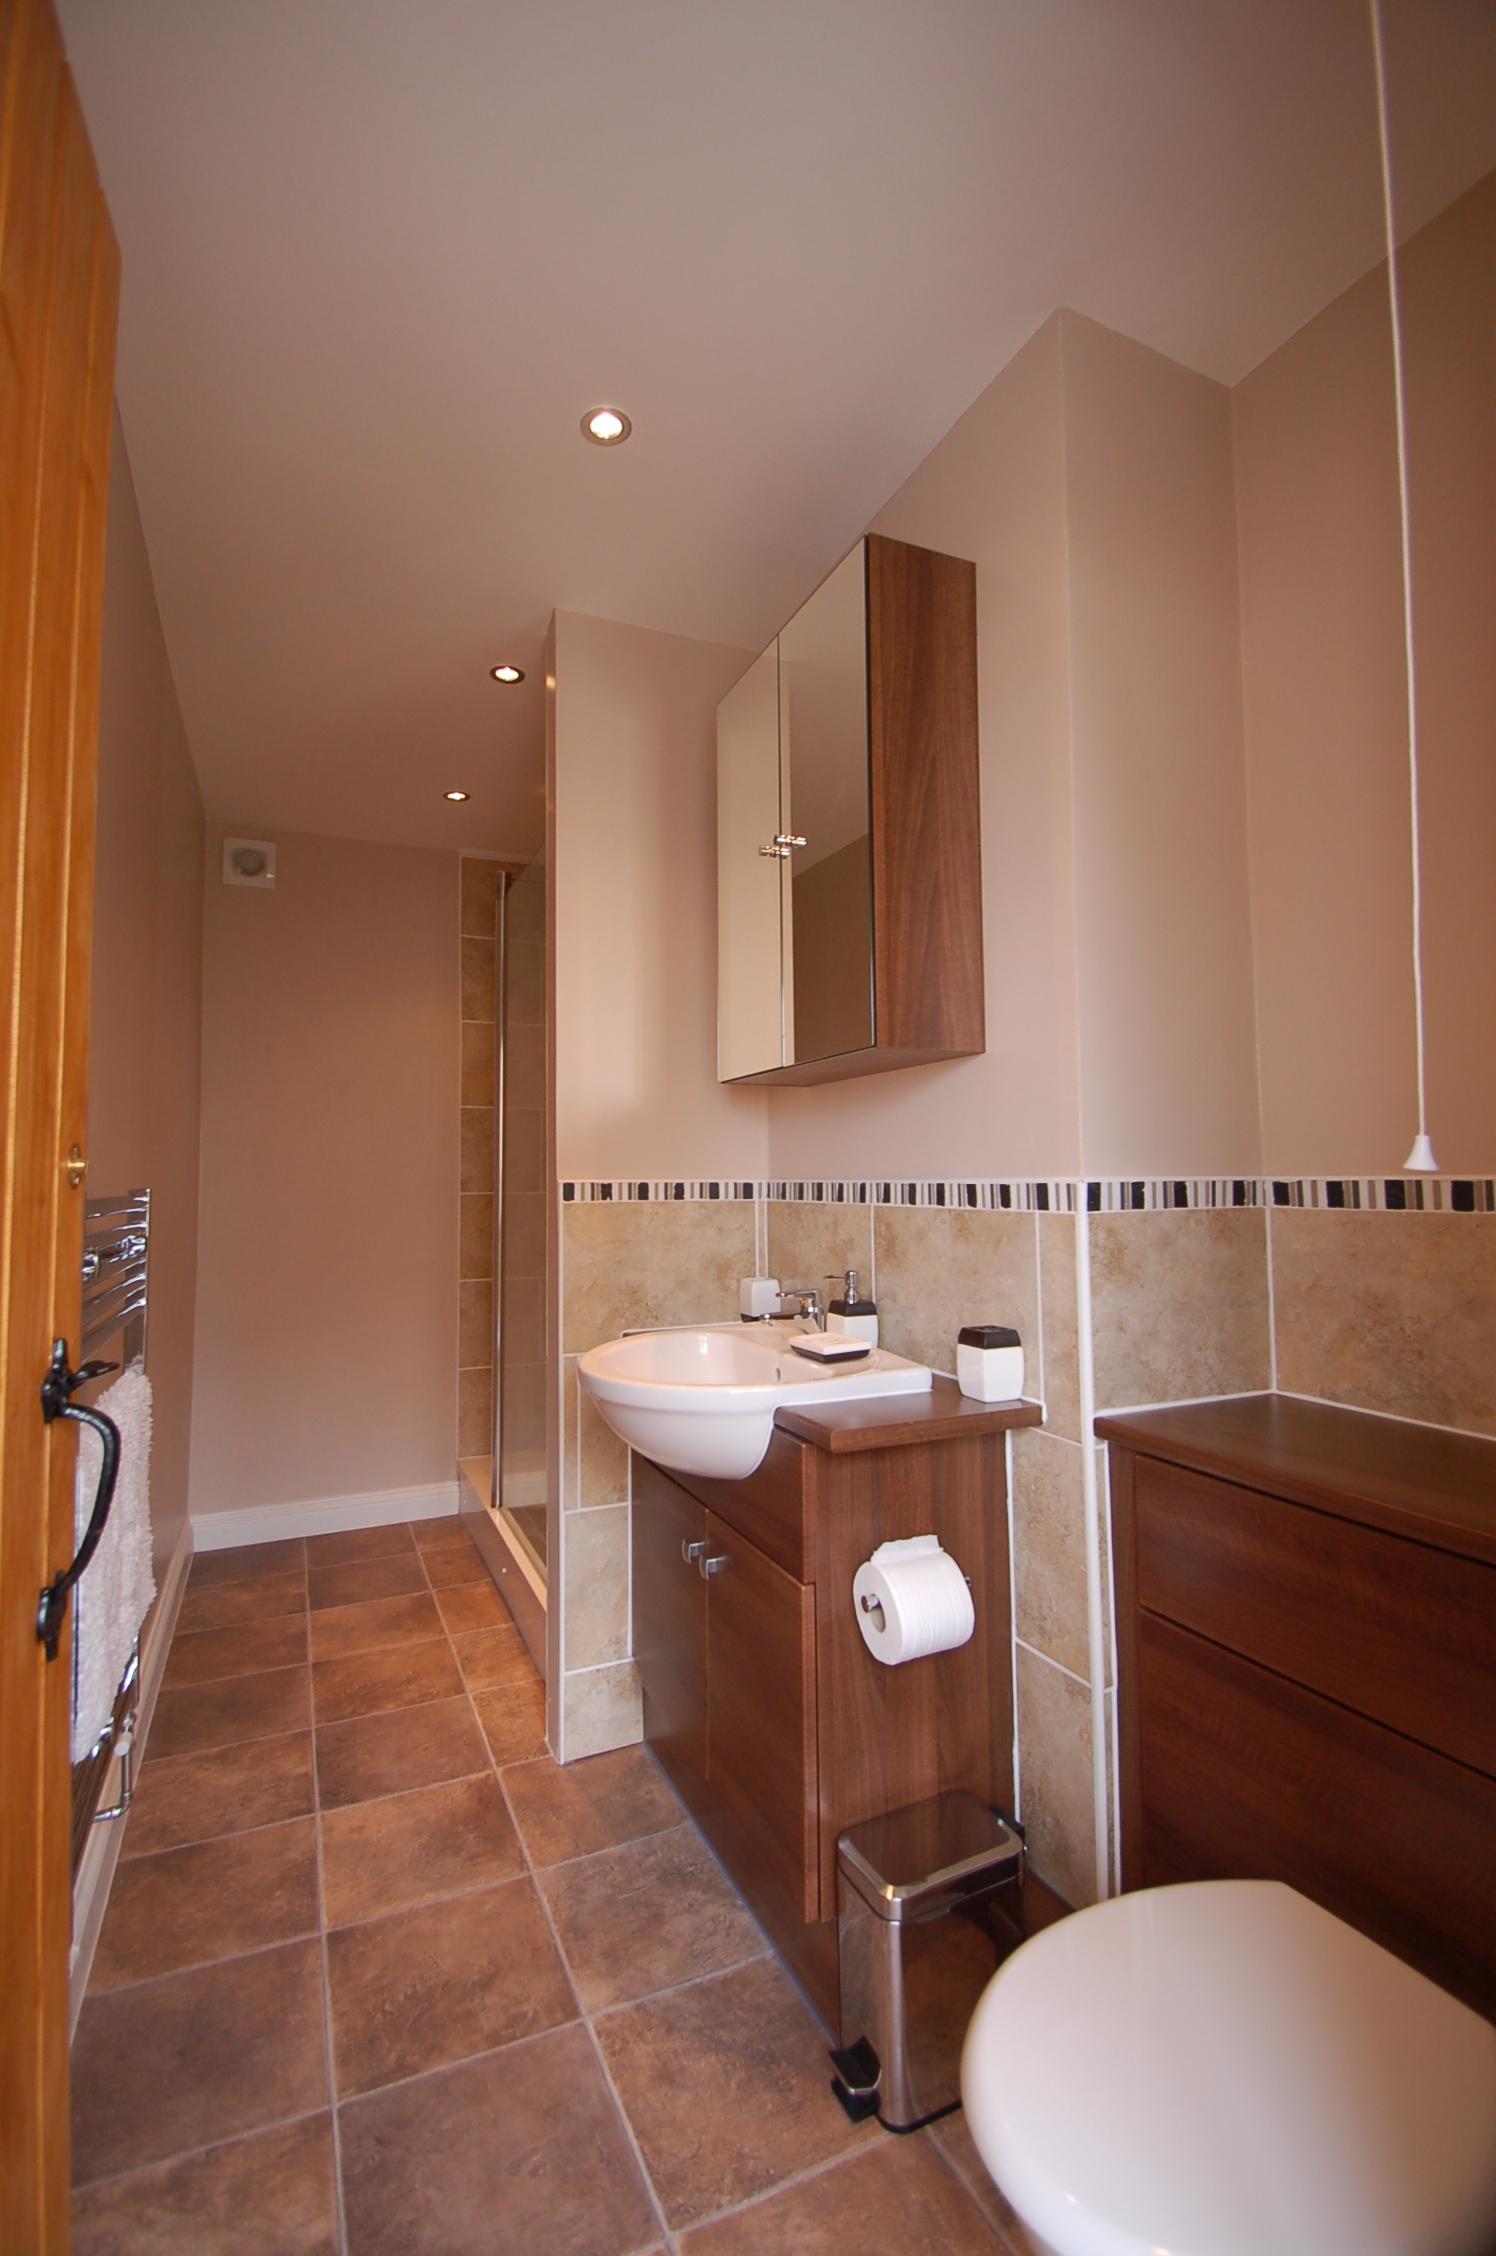 First floor bathroom with walk-in shower